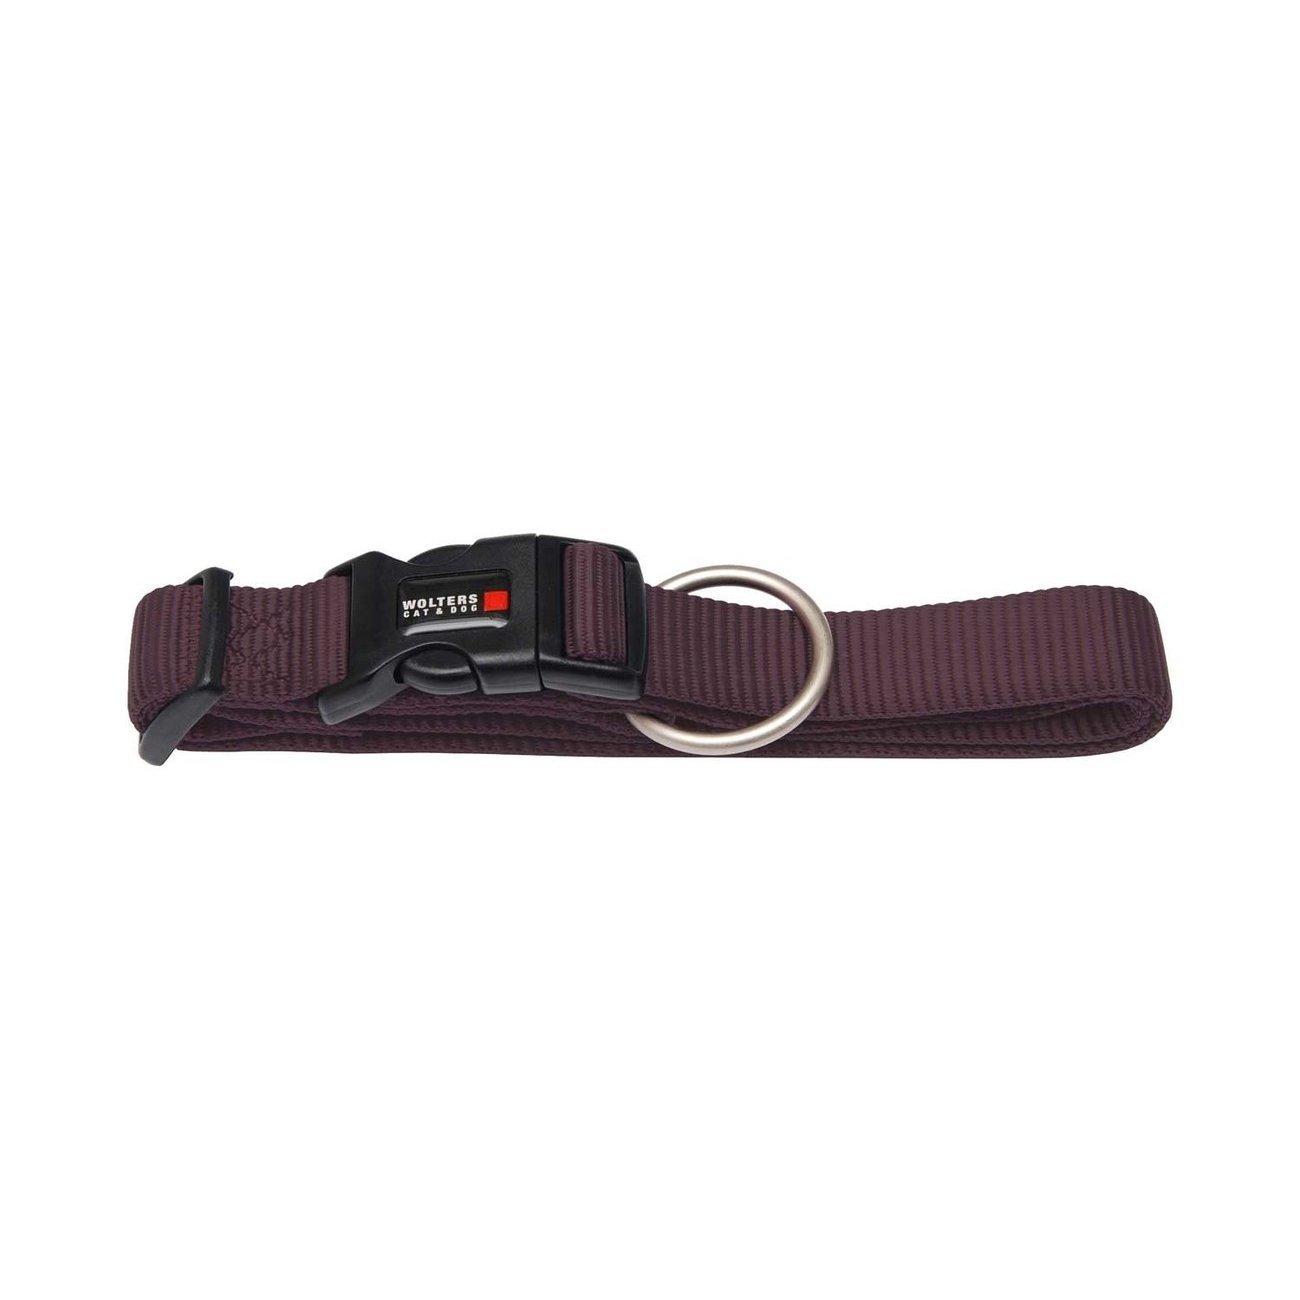 Wolters Halsband Extra Breit Professional Nylon, Bild 4